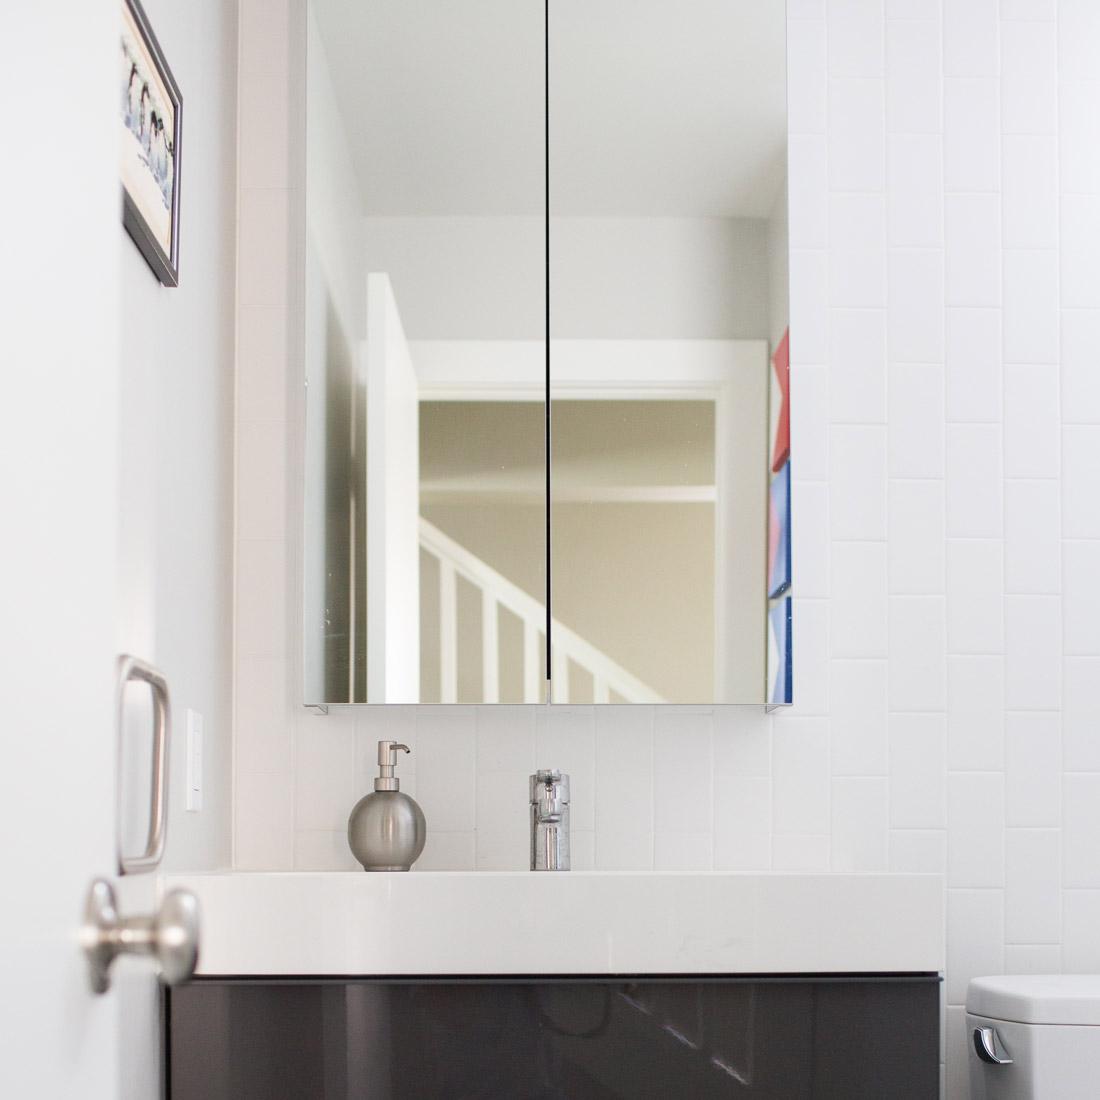 modern guest bathroom vanity with white vertical subway tile backsplash design by sara bates interior design